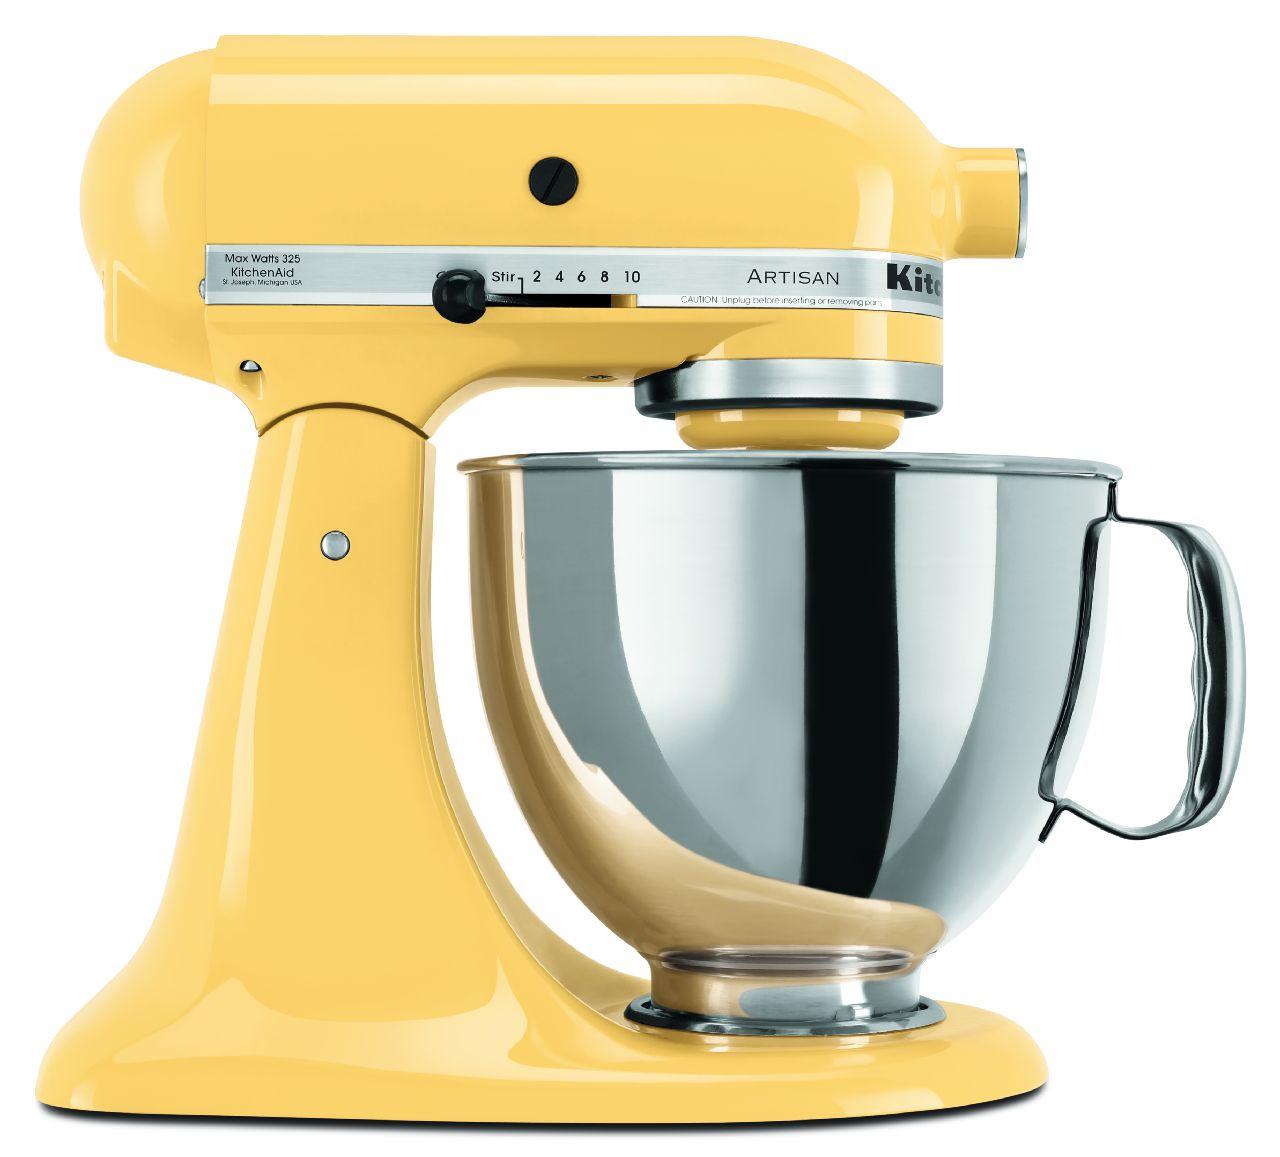 KitchenAid-Artisan-Series-5-Quart-Tilt-Head-Stand-Mixer-10-Speeds-KSM150PS thumbnail 74